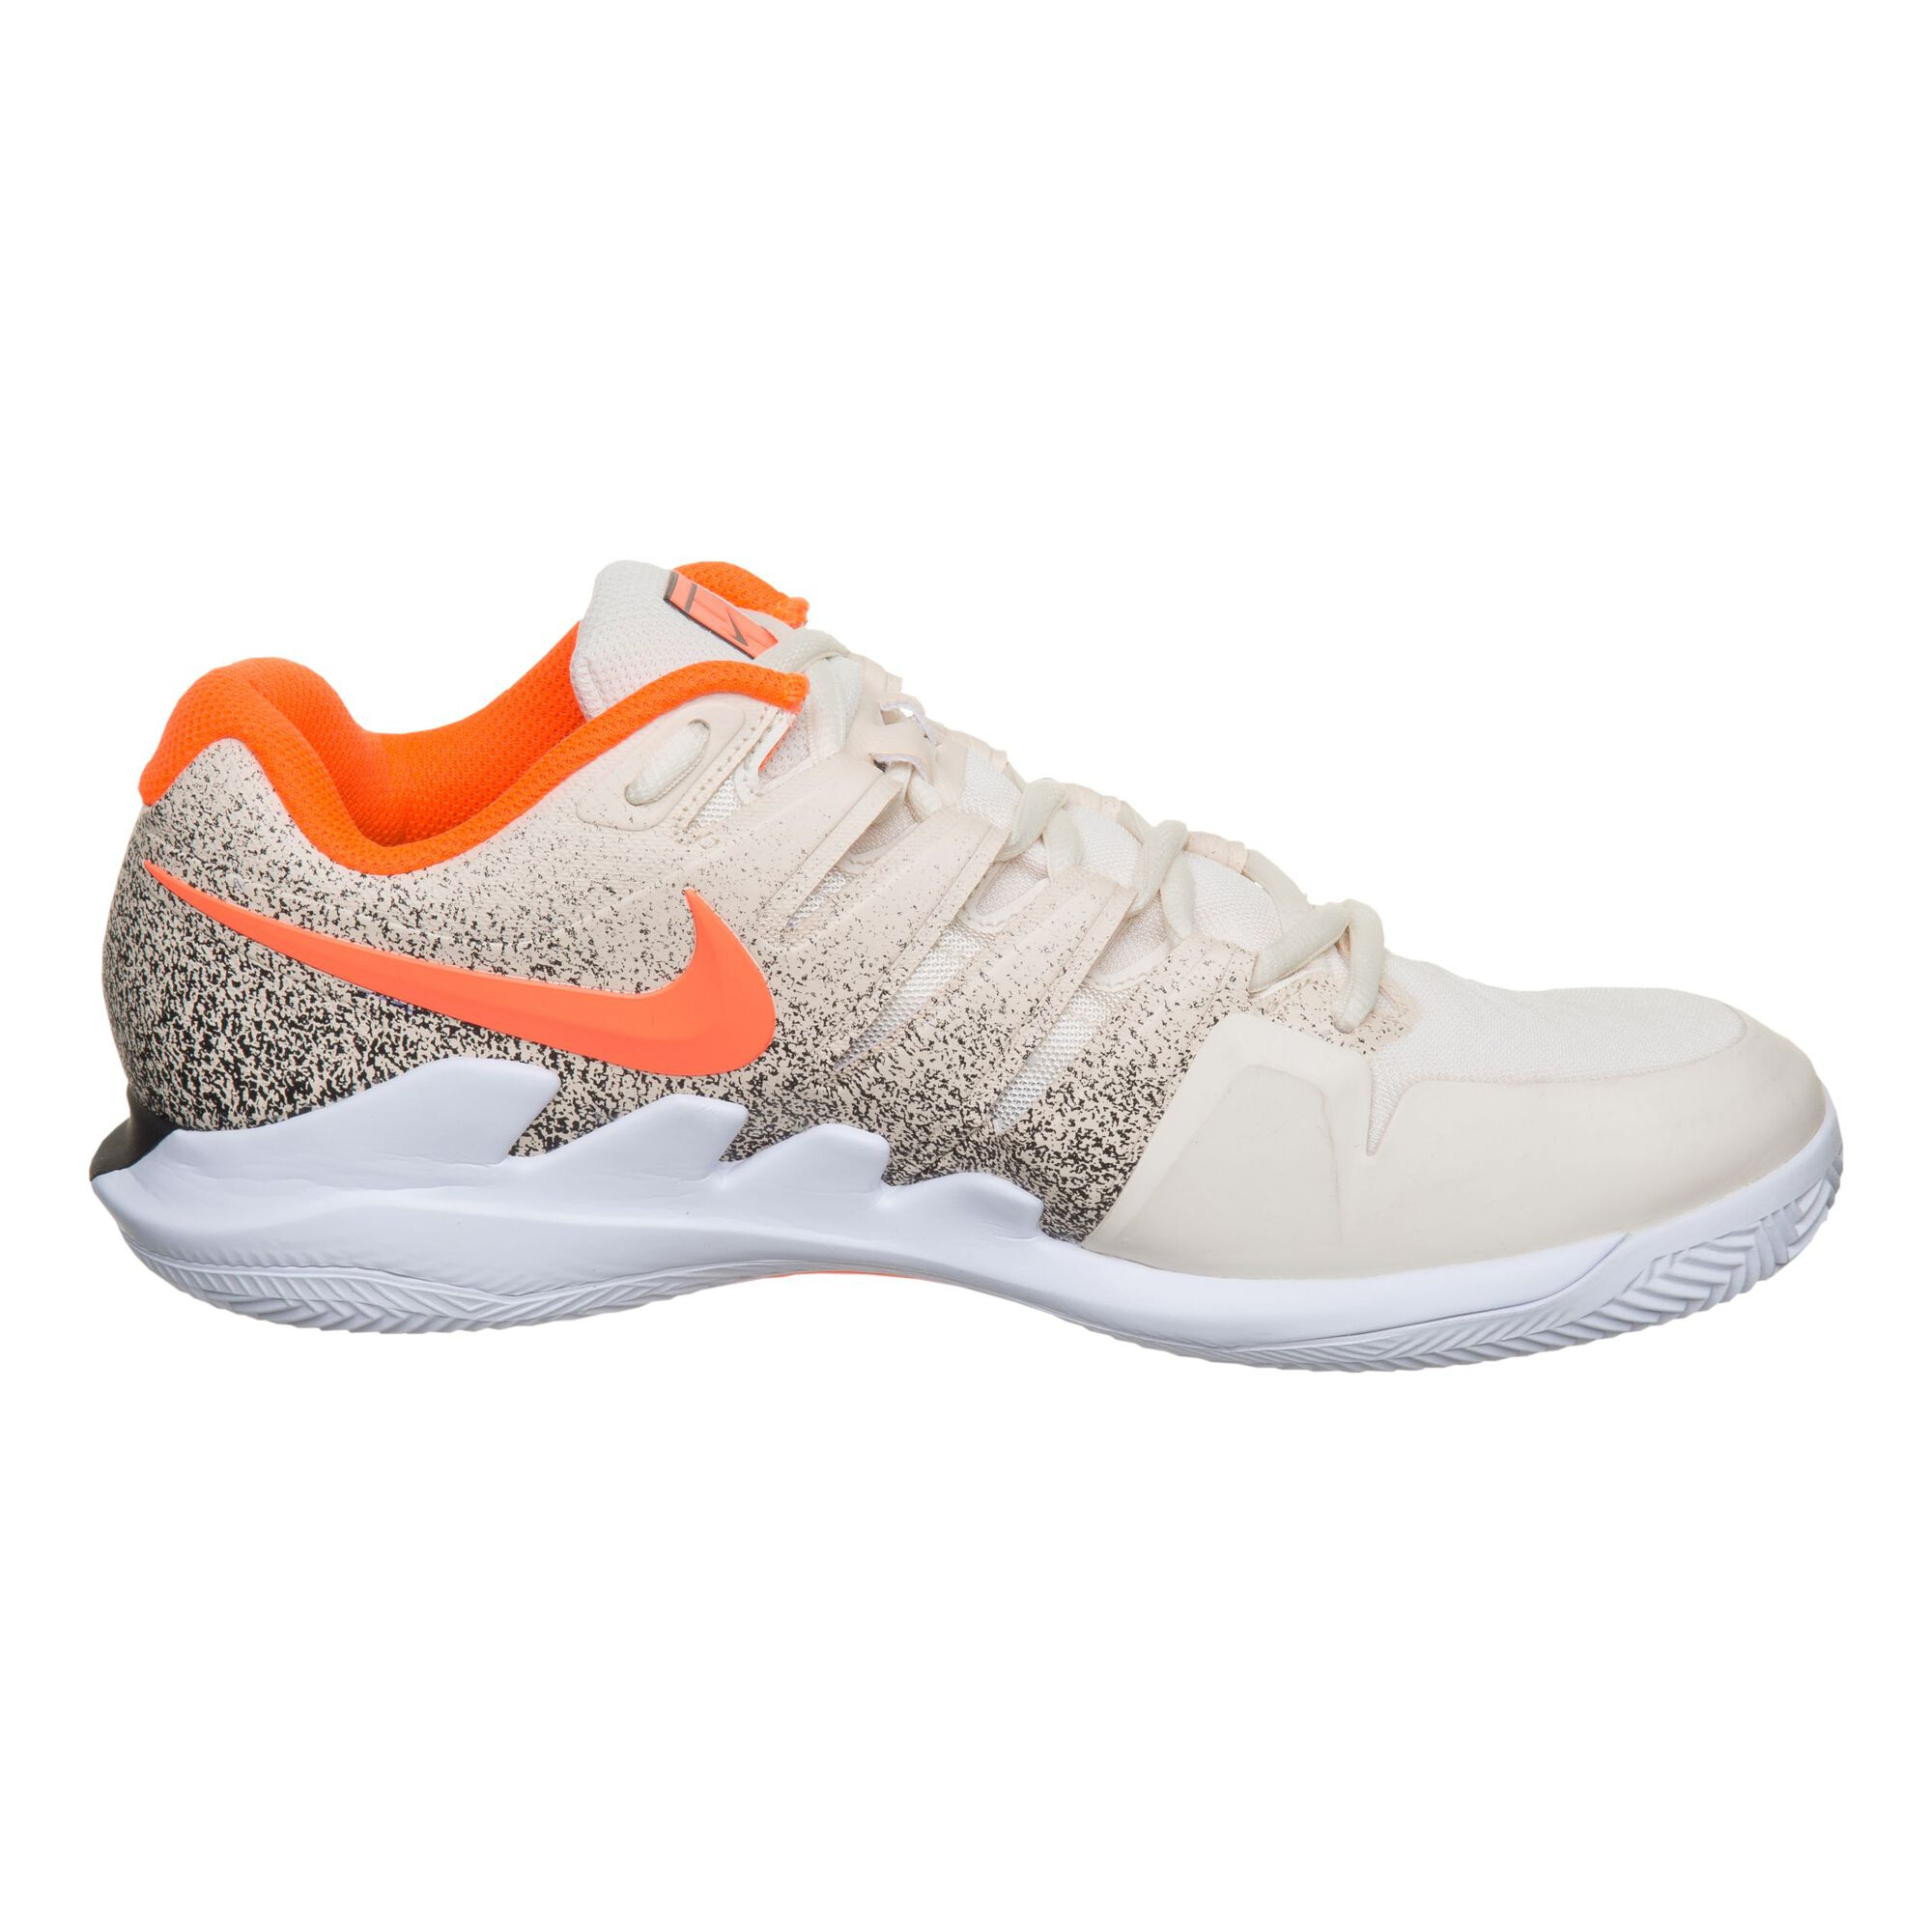 new products c41fb 0df12 Nike  Nike  Nike  Nike  Nike  Nike  Nike  Nike  Nike  Nike  Nike. Air Zoom  Vapor X ...